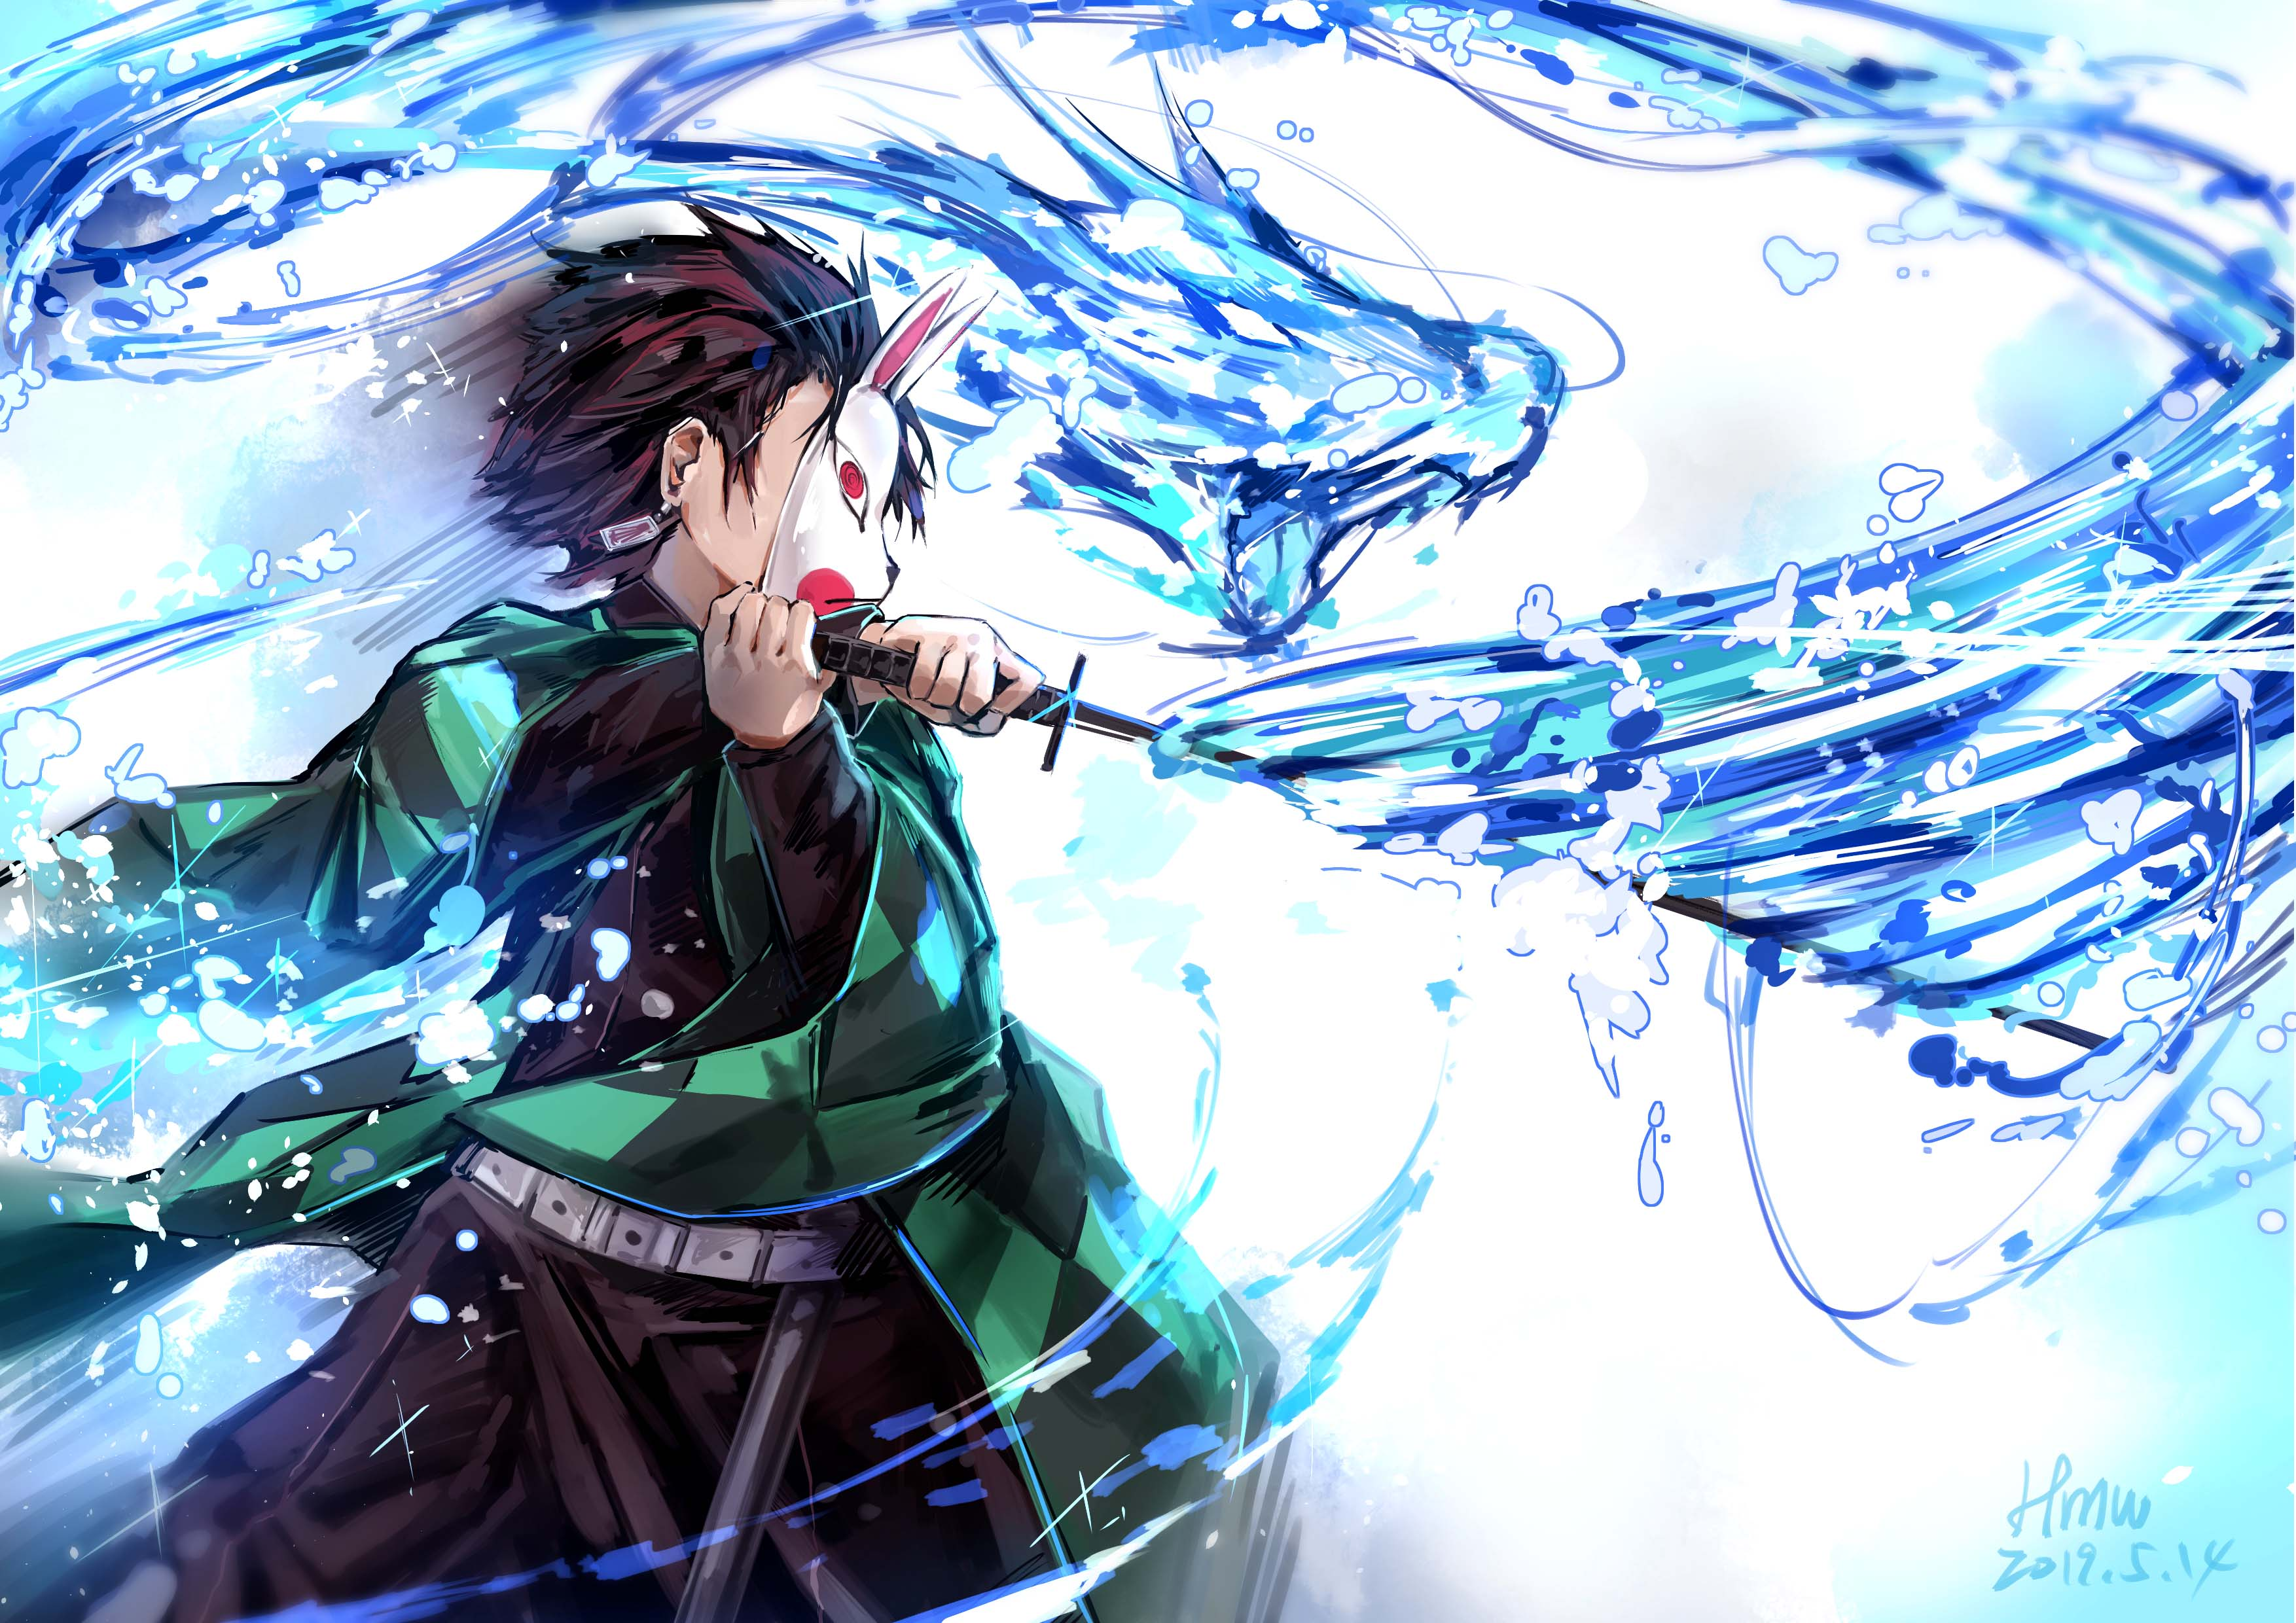 Fondos de pantalla Anime Tanjirou Kamado personaje de Los Guardianes de la Noche